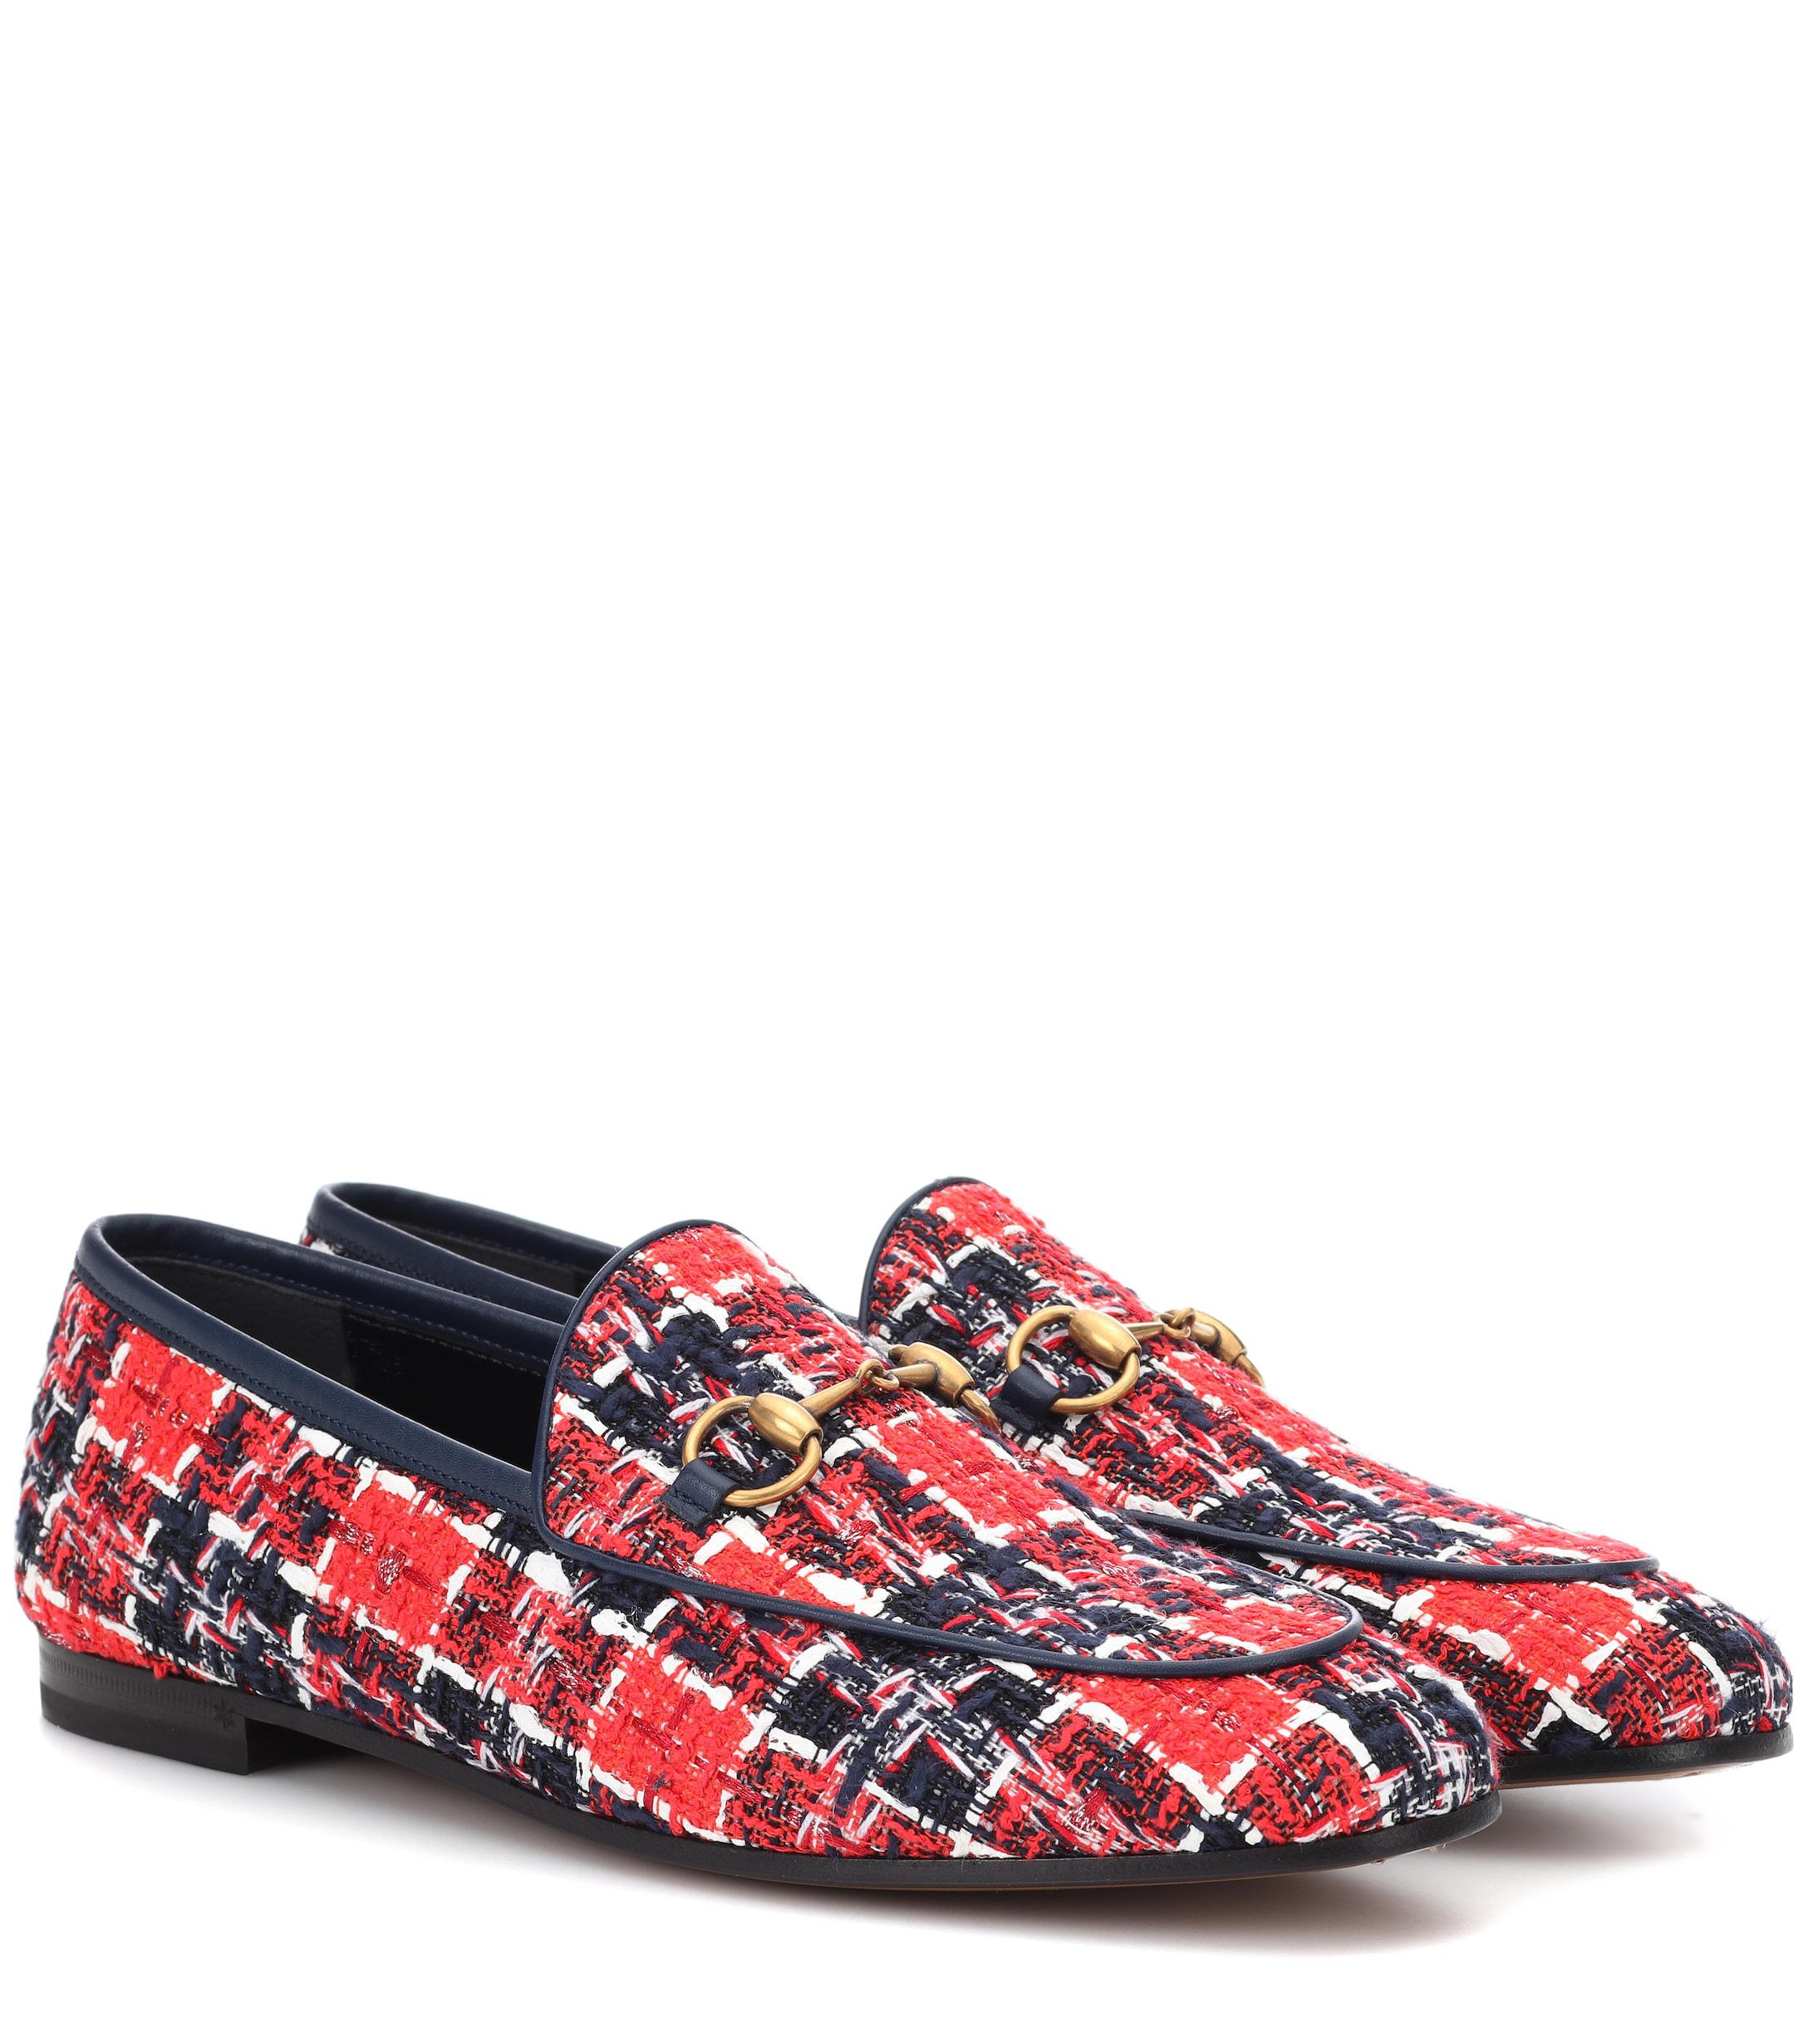 723ed319e Gucci. Women's Jordaan Tweed Loafers